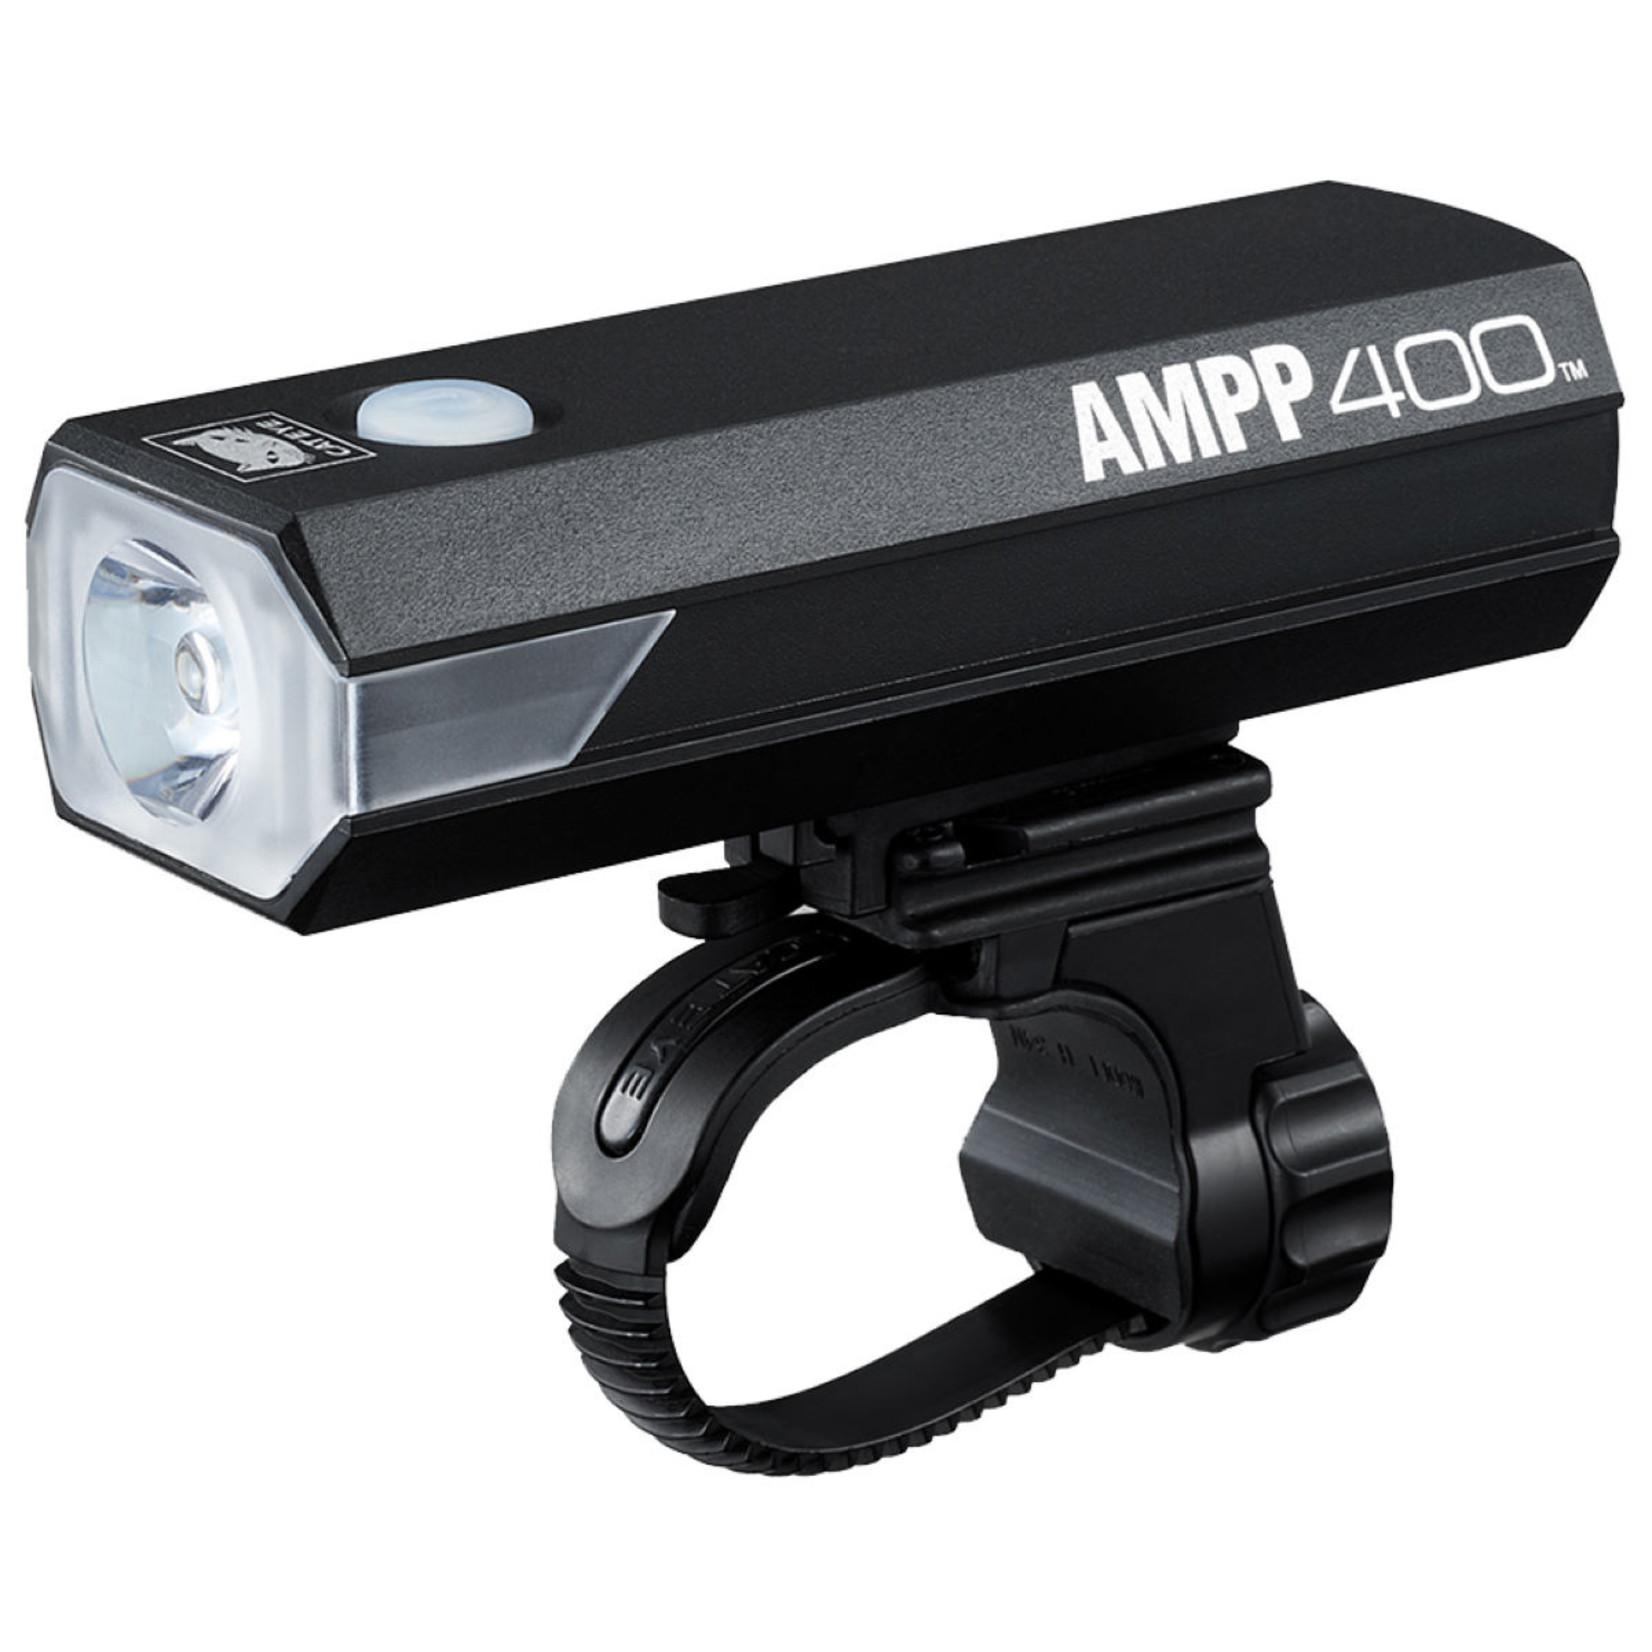 Cateye AMPP400 Front Light